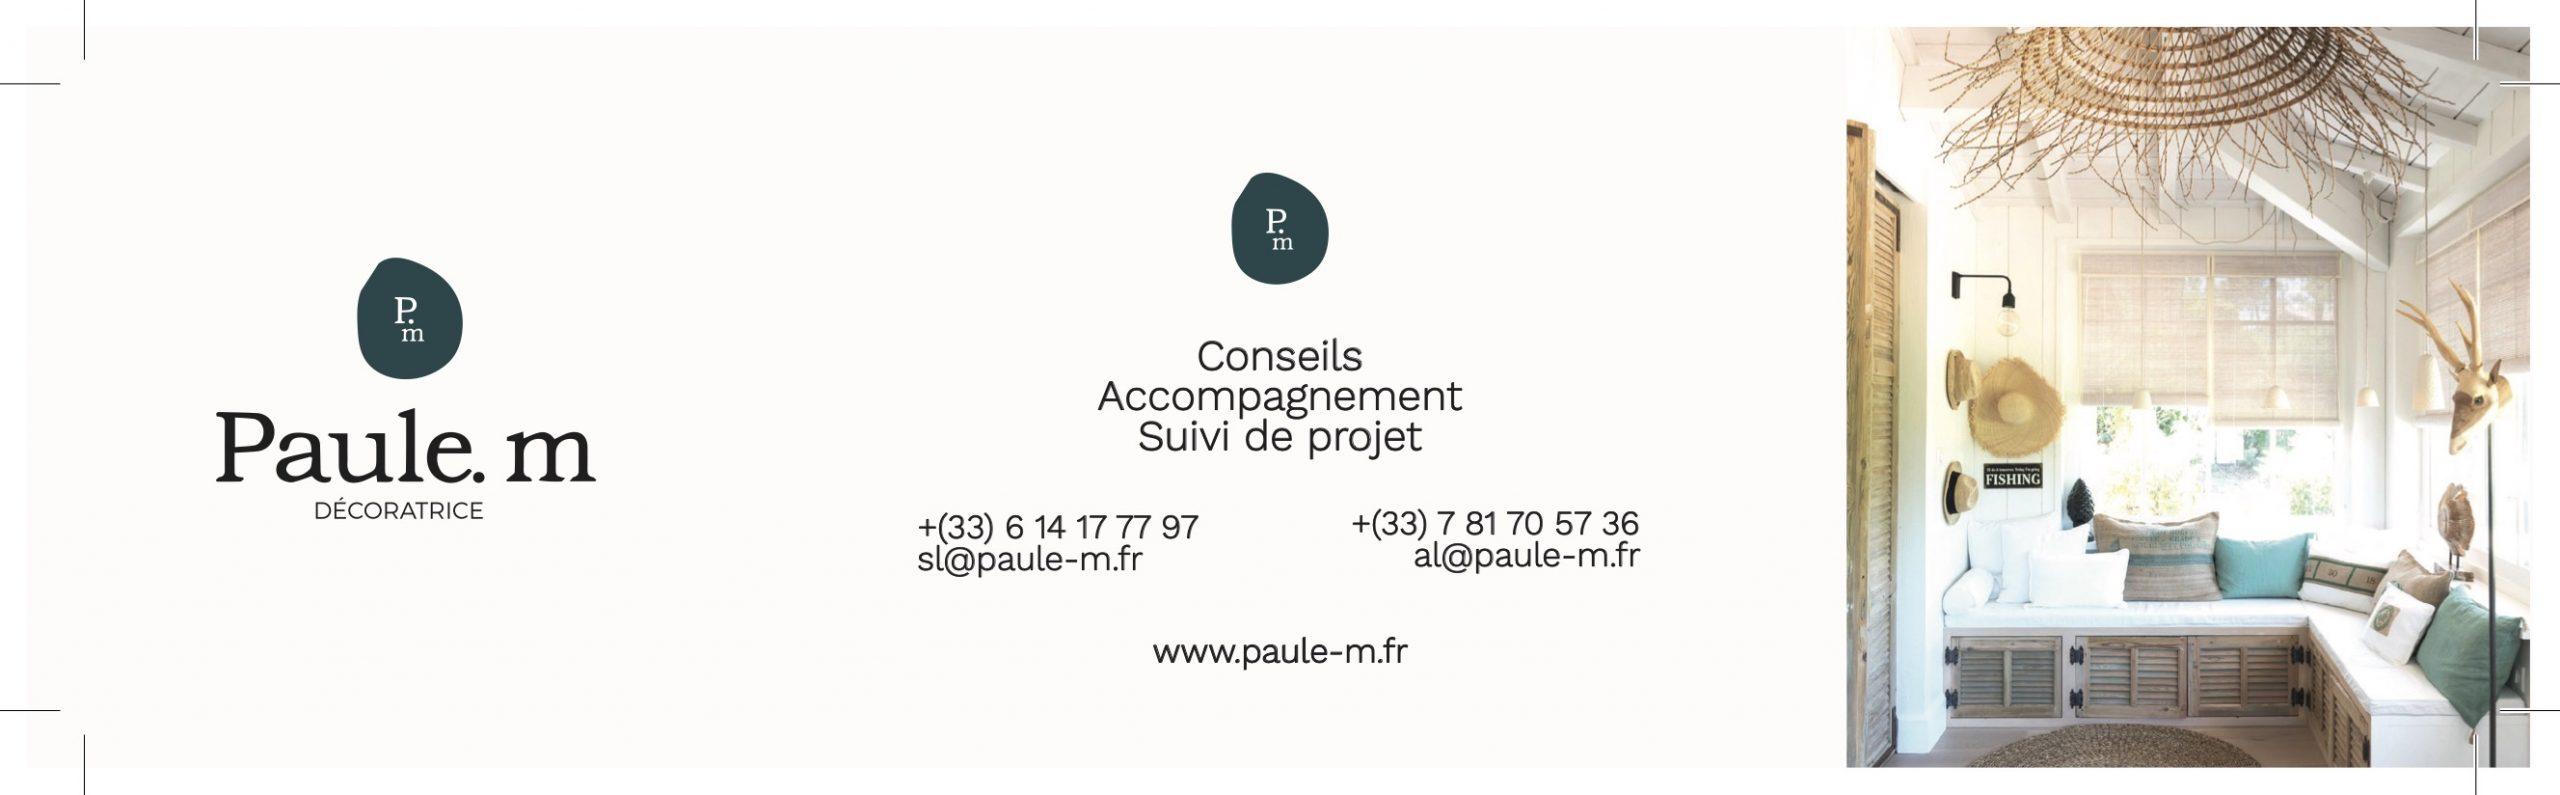 PAULE-M · LOGO · CDV · WEBSITE